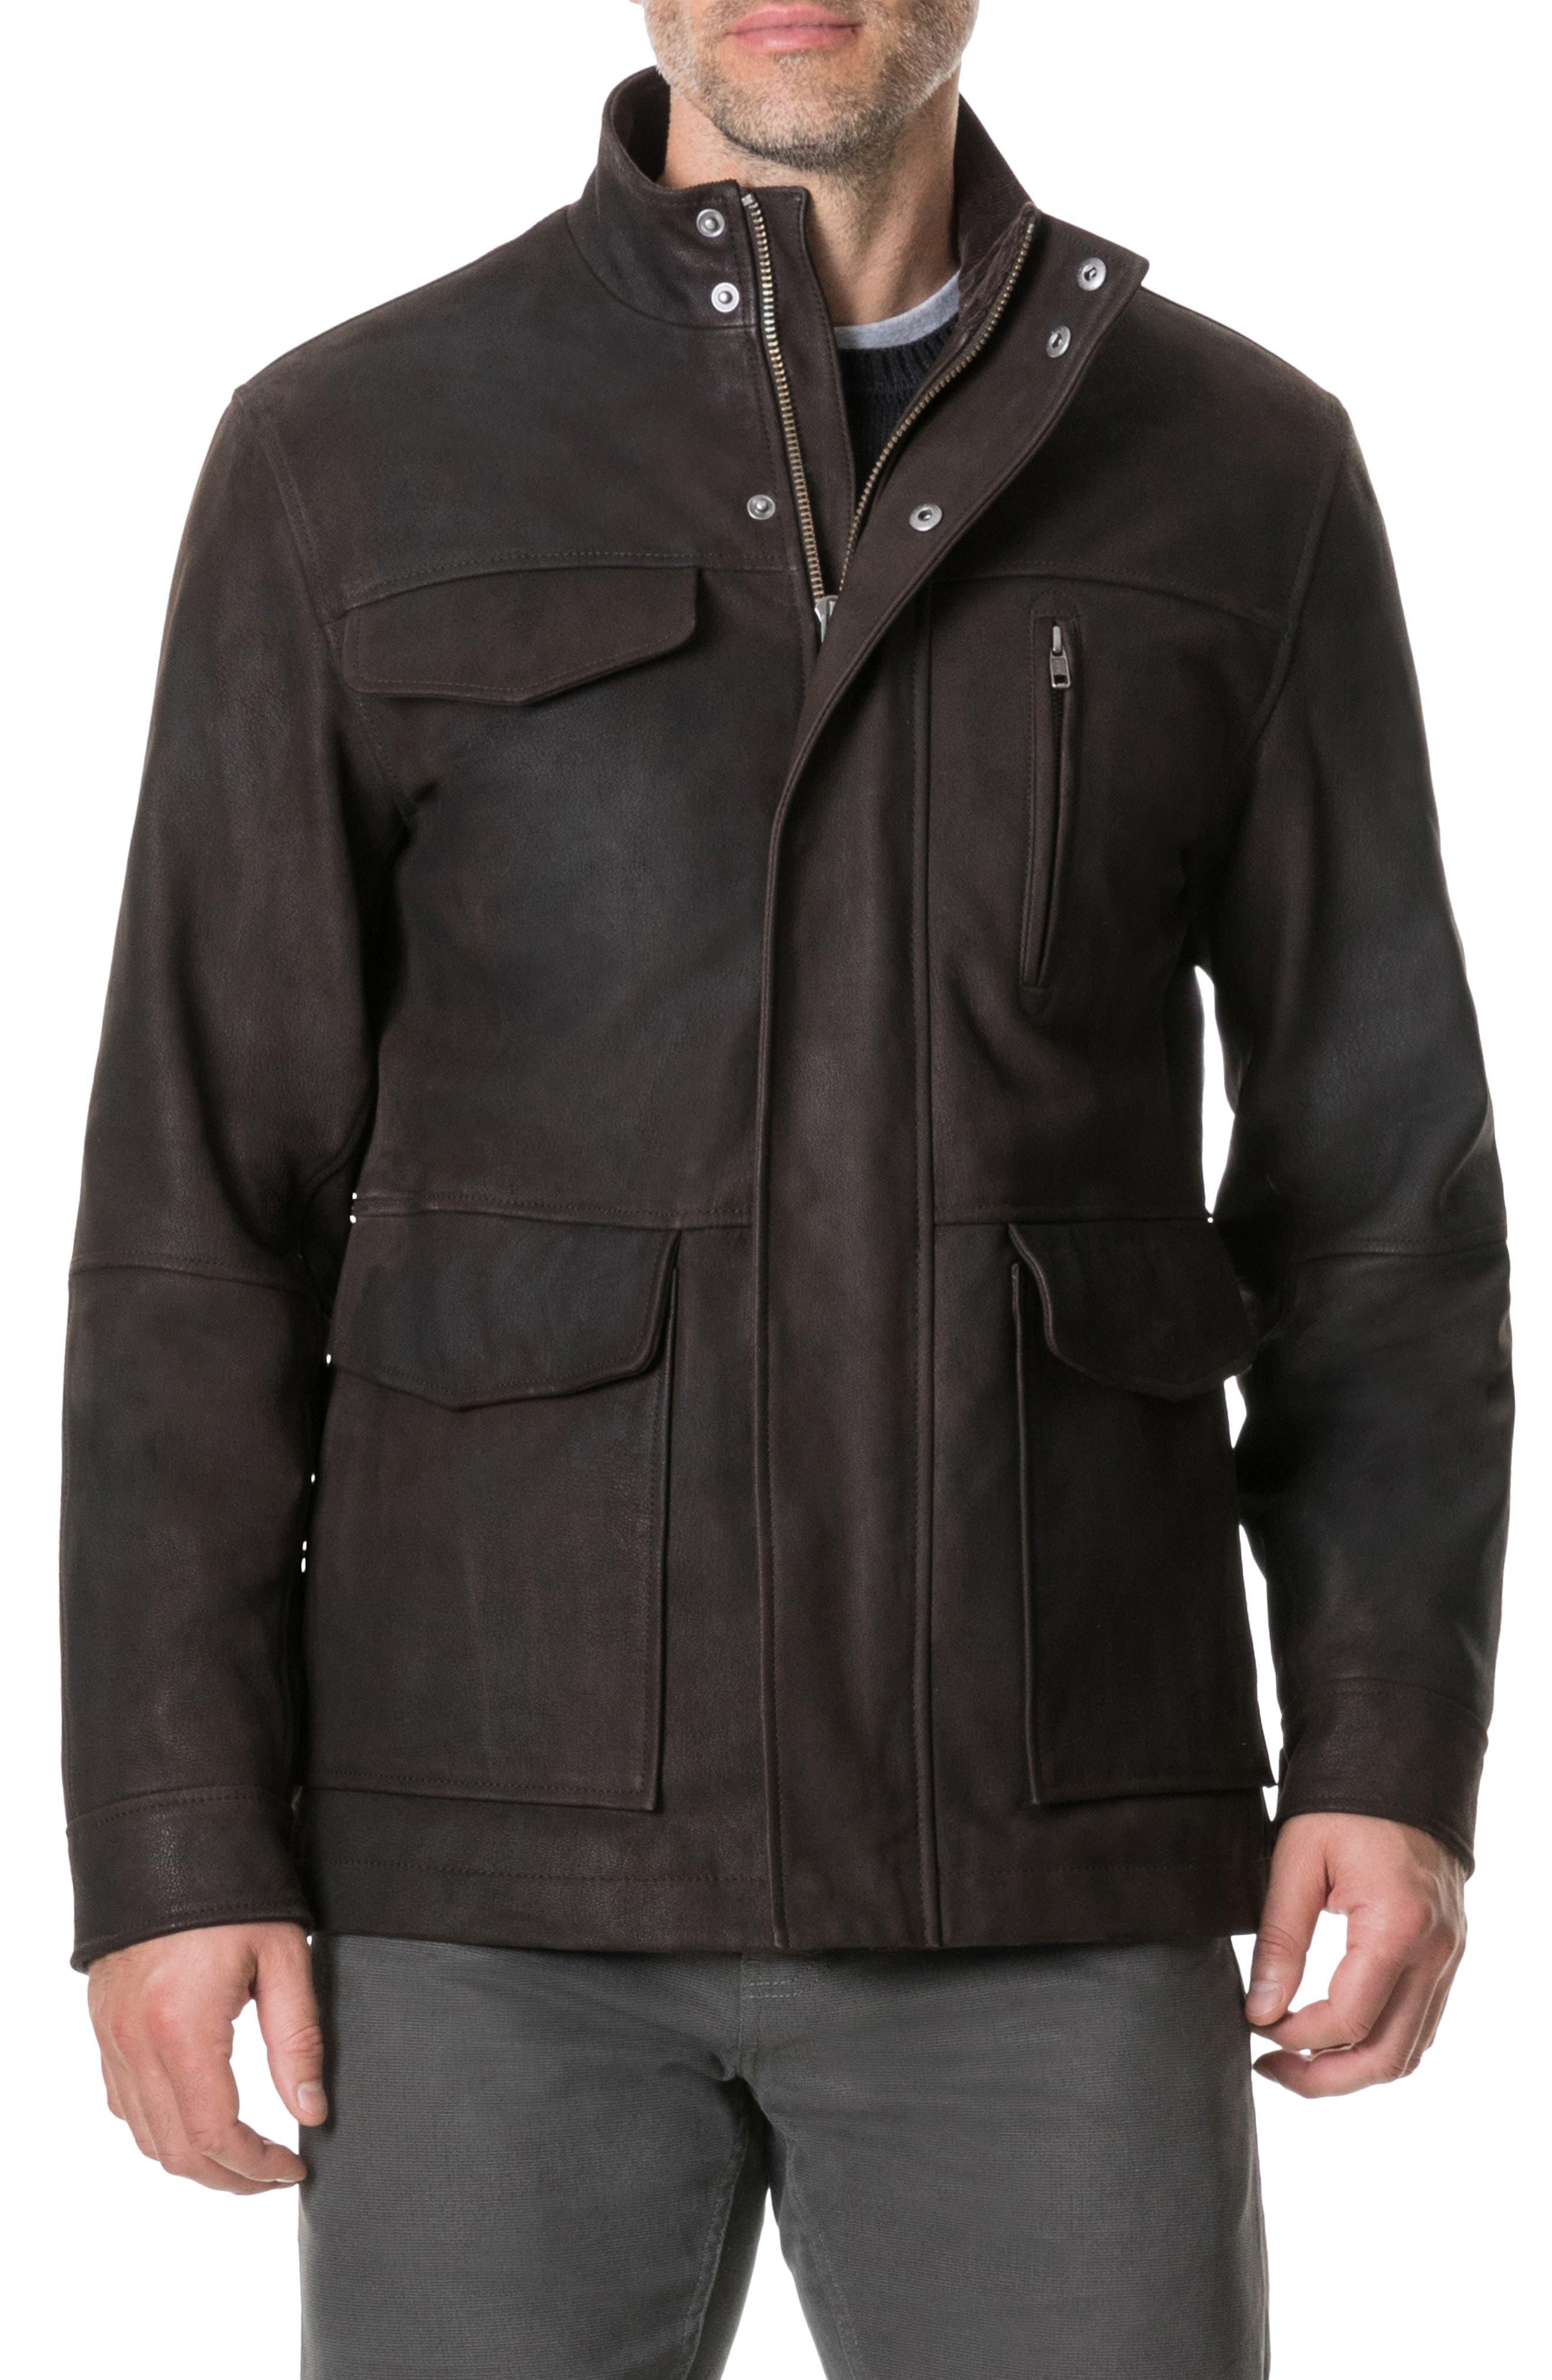 Fairholme Leather Jacket,                         Main,                         color, CHOCOLATE